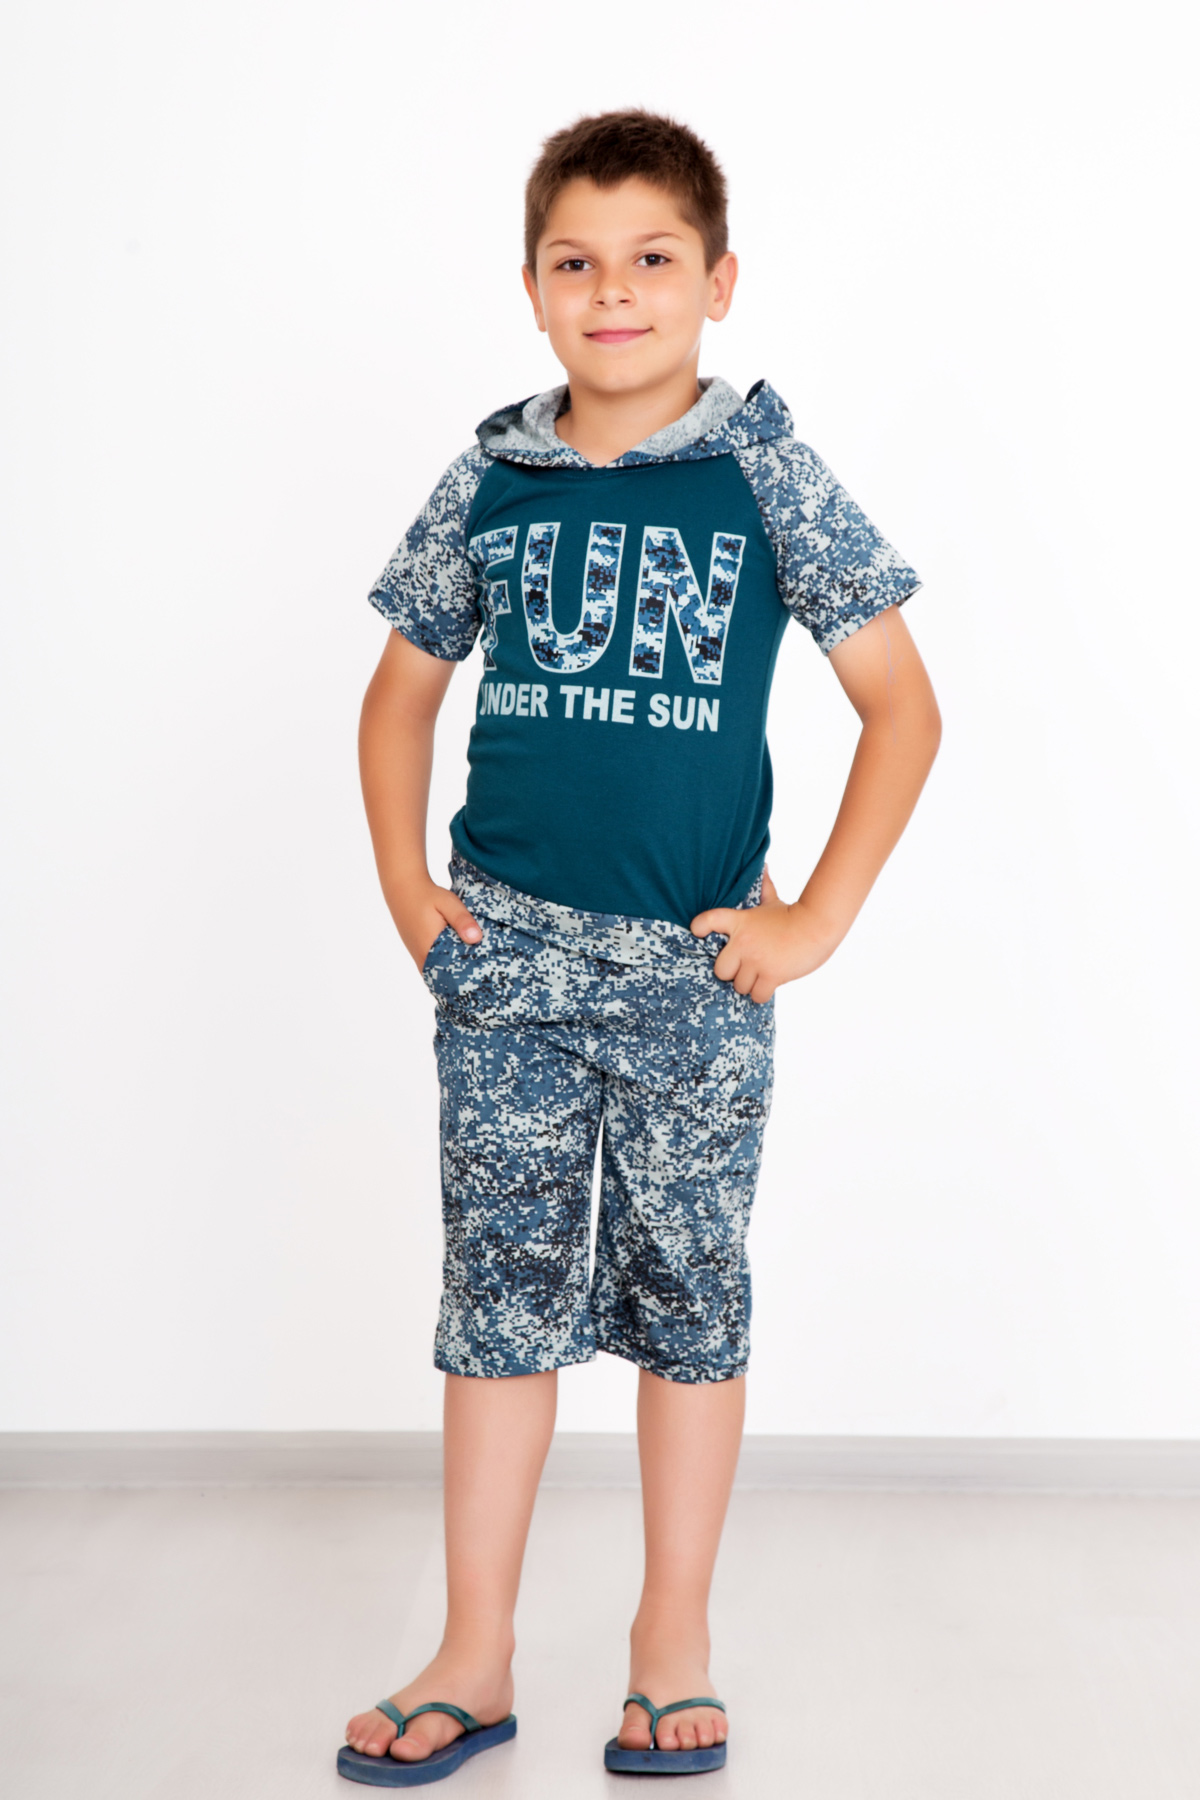 Дет. костюм Ким р. 30Костюмы<br><br><br>Тип: Дет. костюм<br>Размер: 30<br>Материал: Кулирка